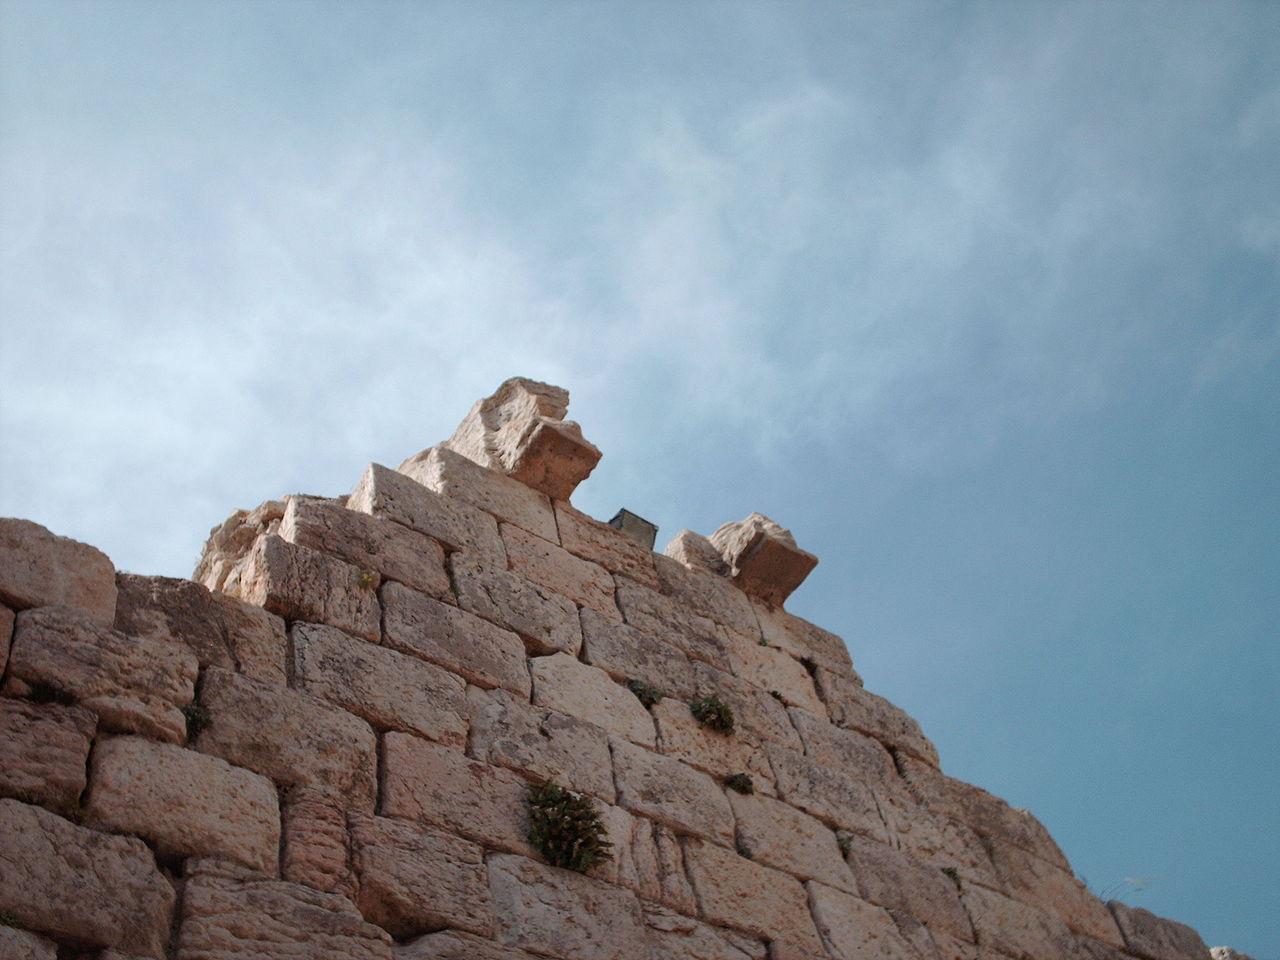 معبد آناهیتای بیشاپور، کازرون